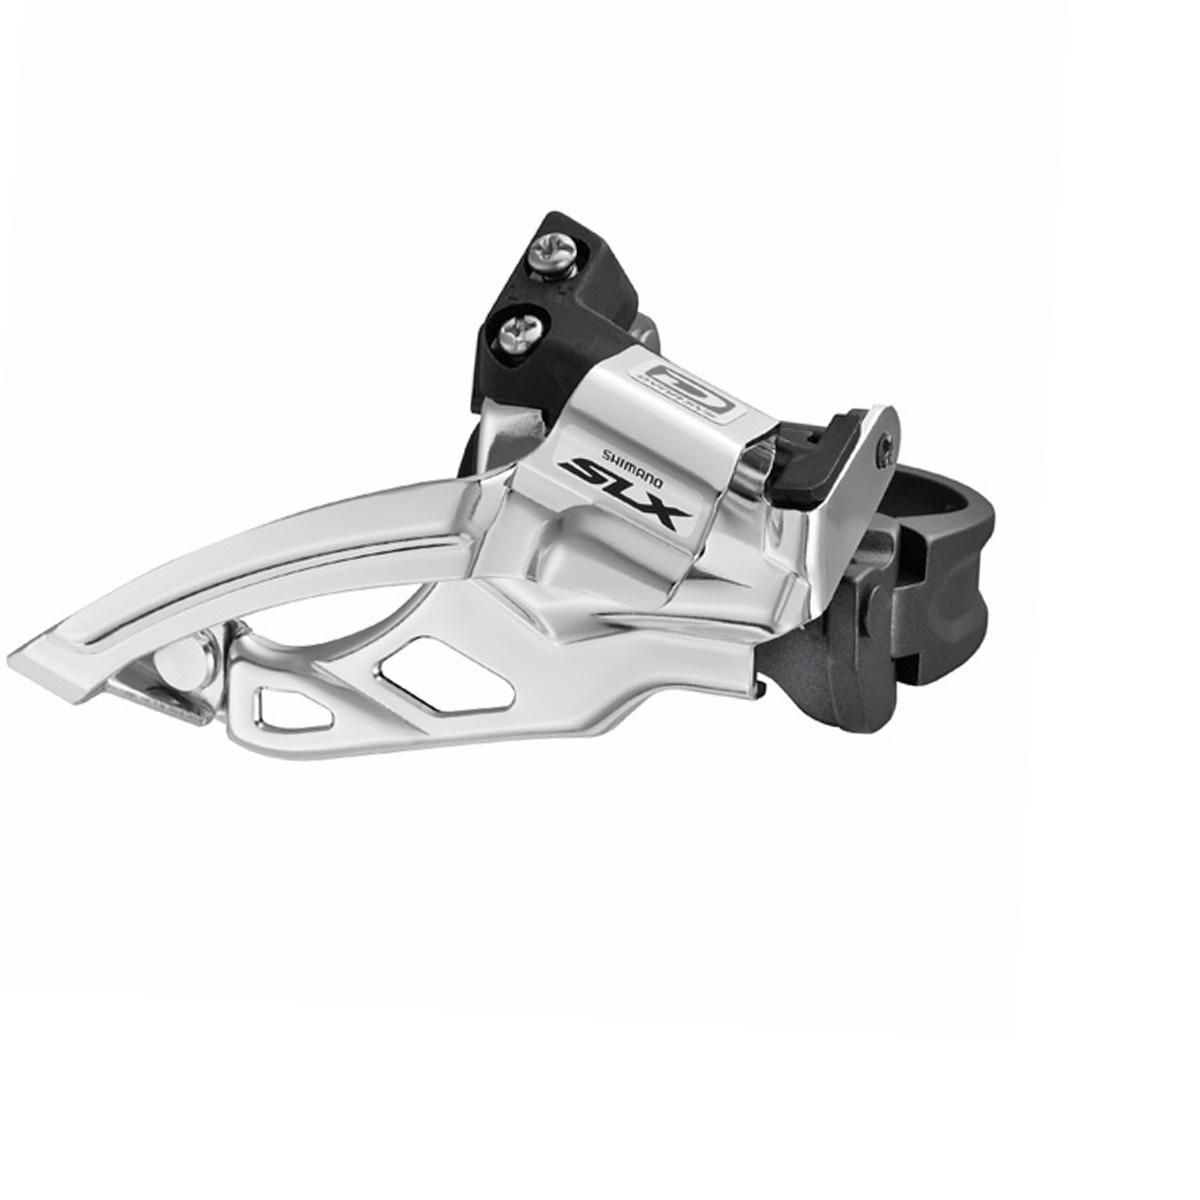 Dérailleur avant VTT Shimano SLX 10V Double collier bas